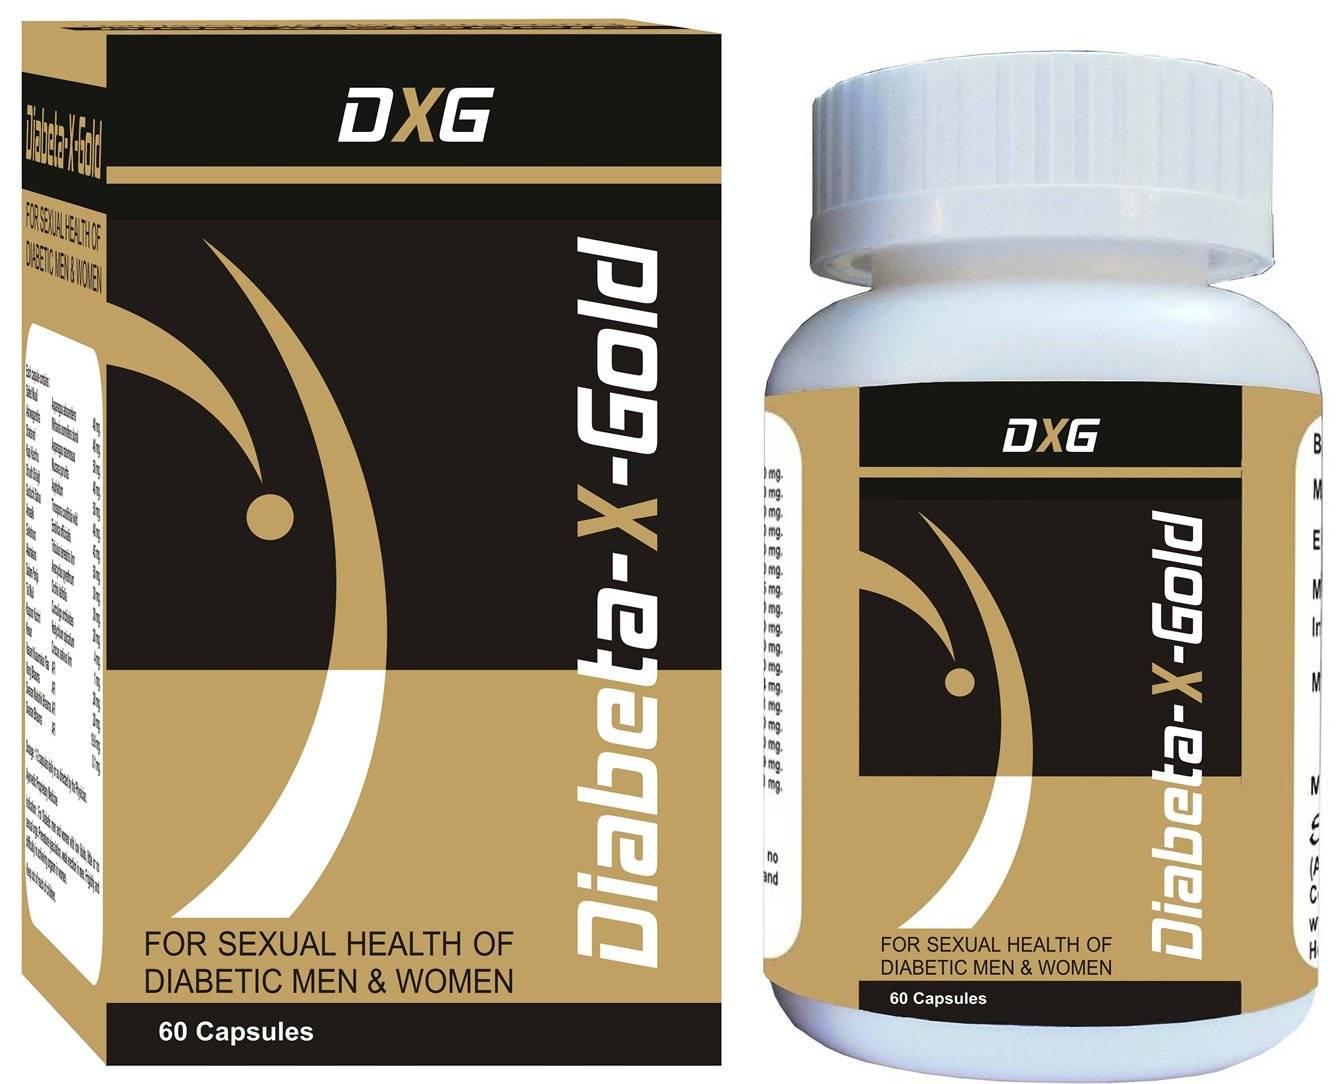 Diabeta-X-Gold-For Sexual Health of Diabetic Men & Women